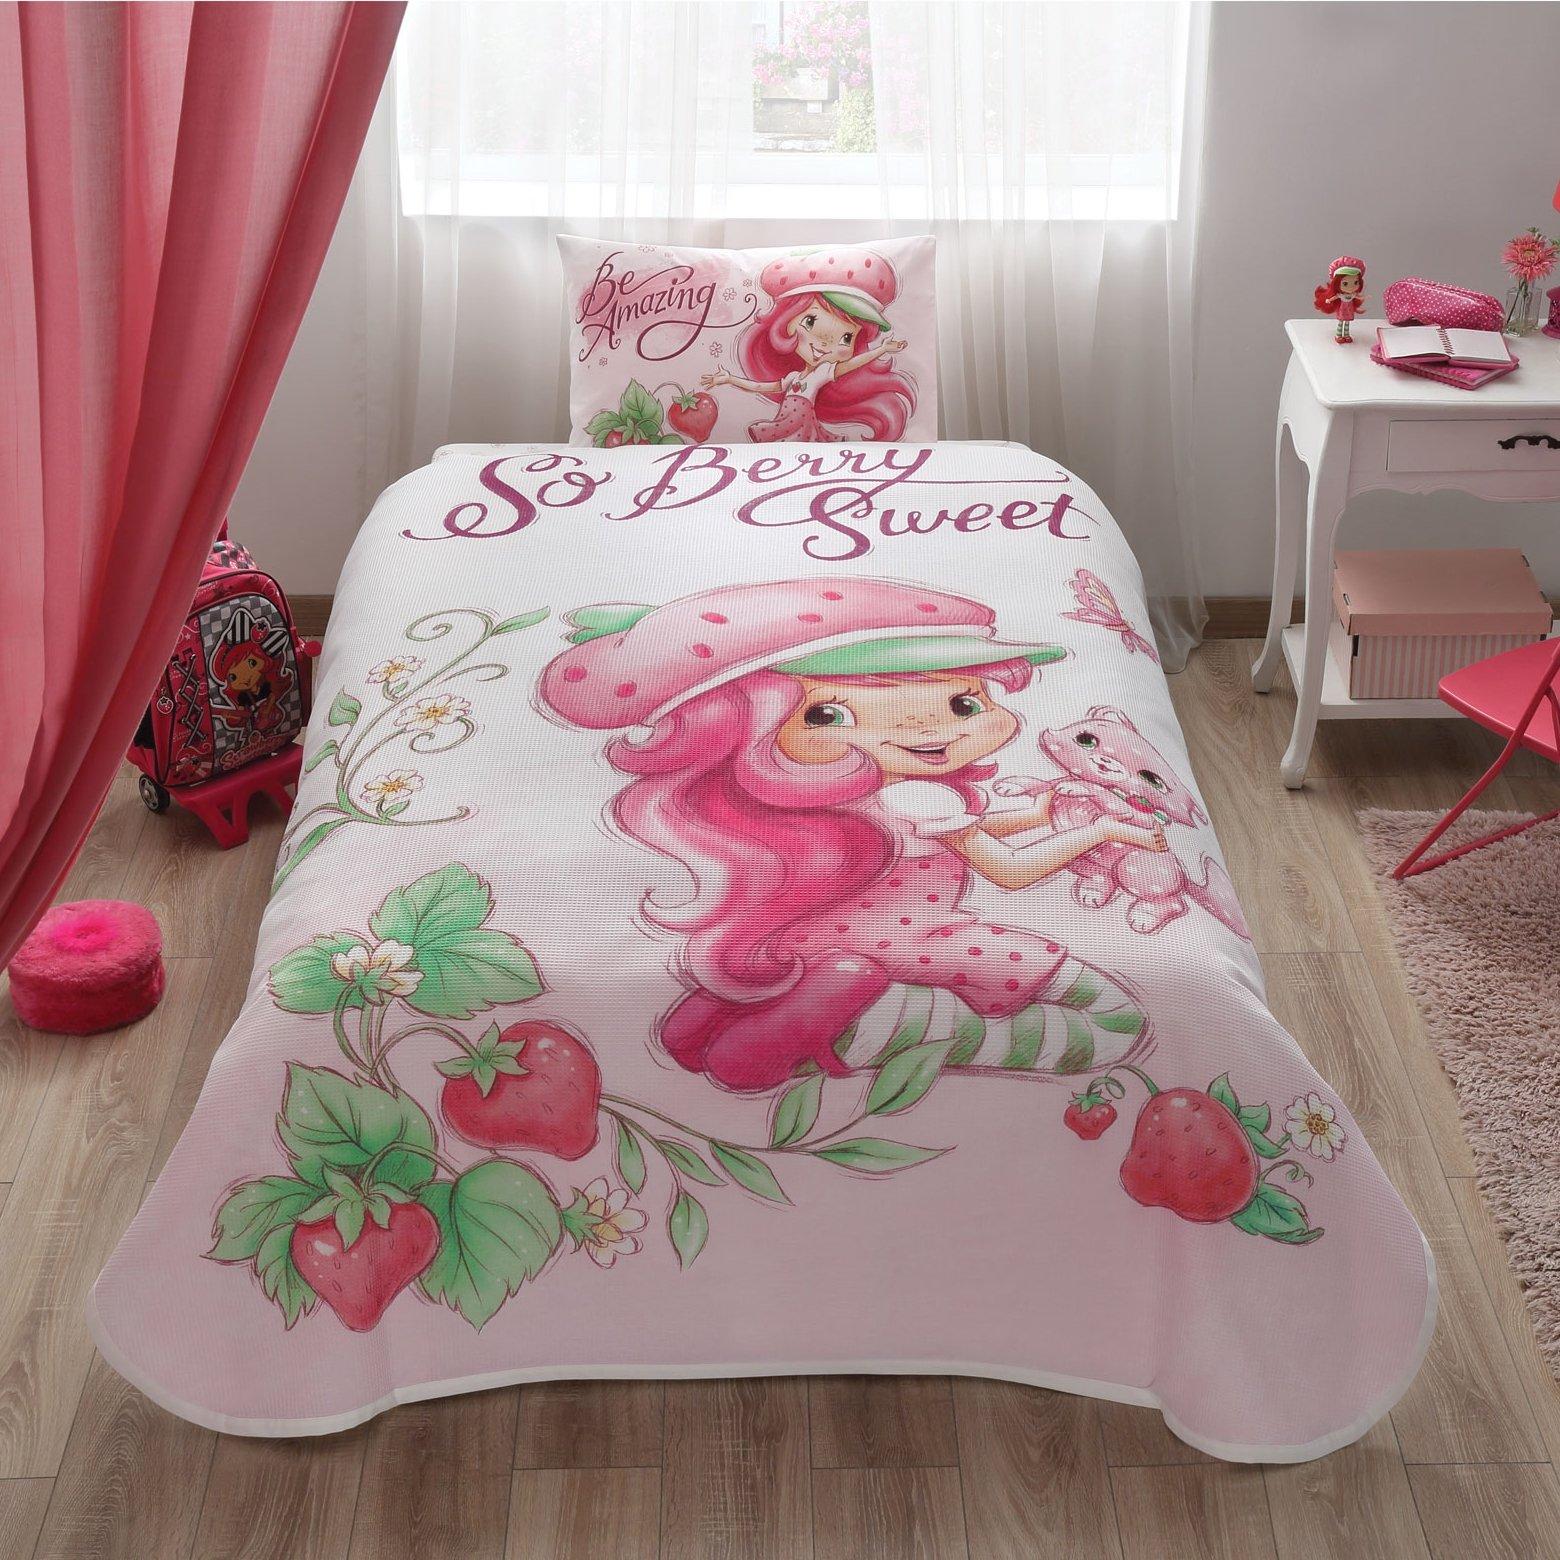 Disney Strawberry Shortcake Girl's Coverlet Set Bedspread Pique Single / Twin Size Kids Bedspread/Coverlet